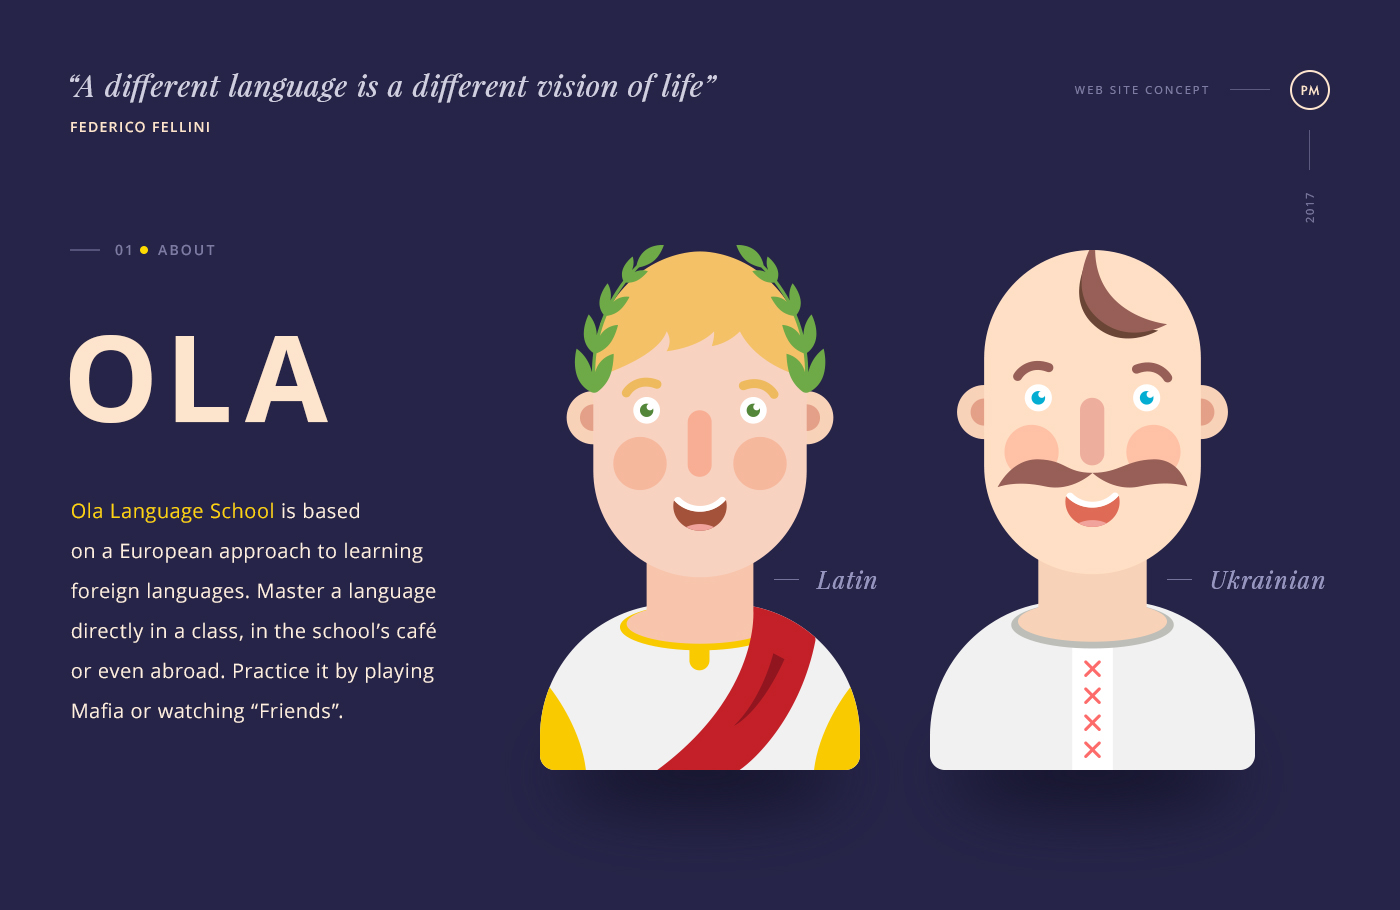 school clear study knowledge language trip Web design UI ux